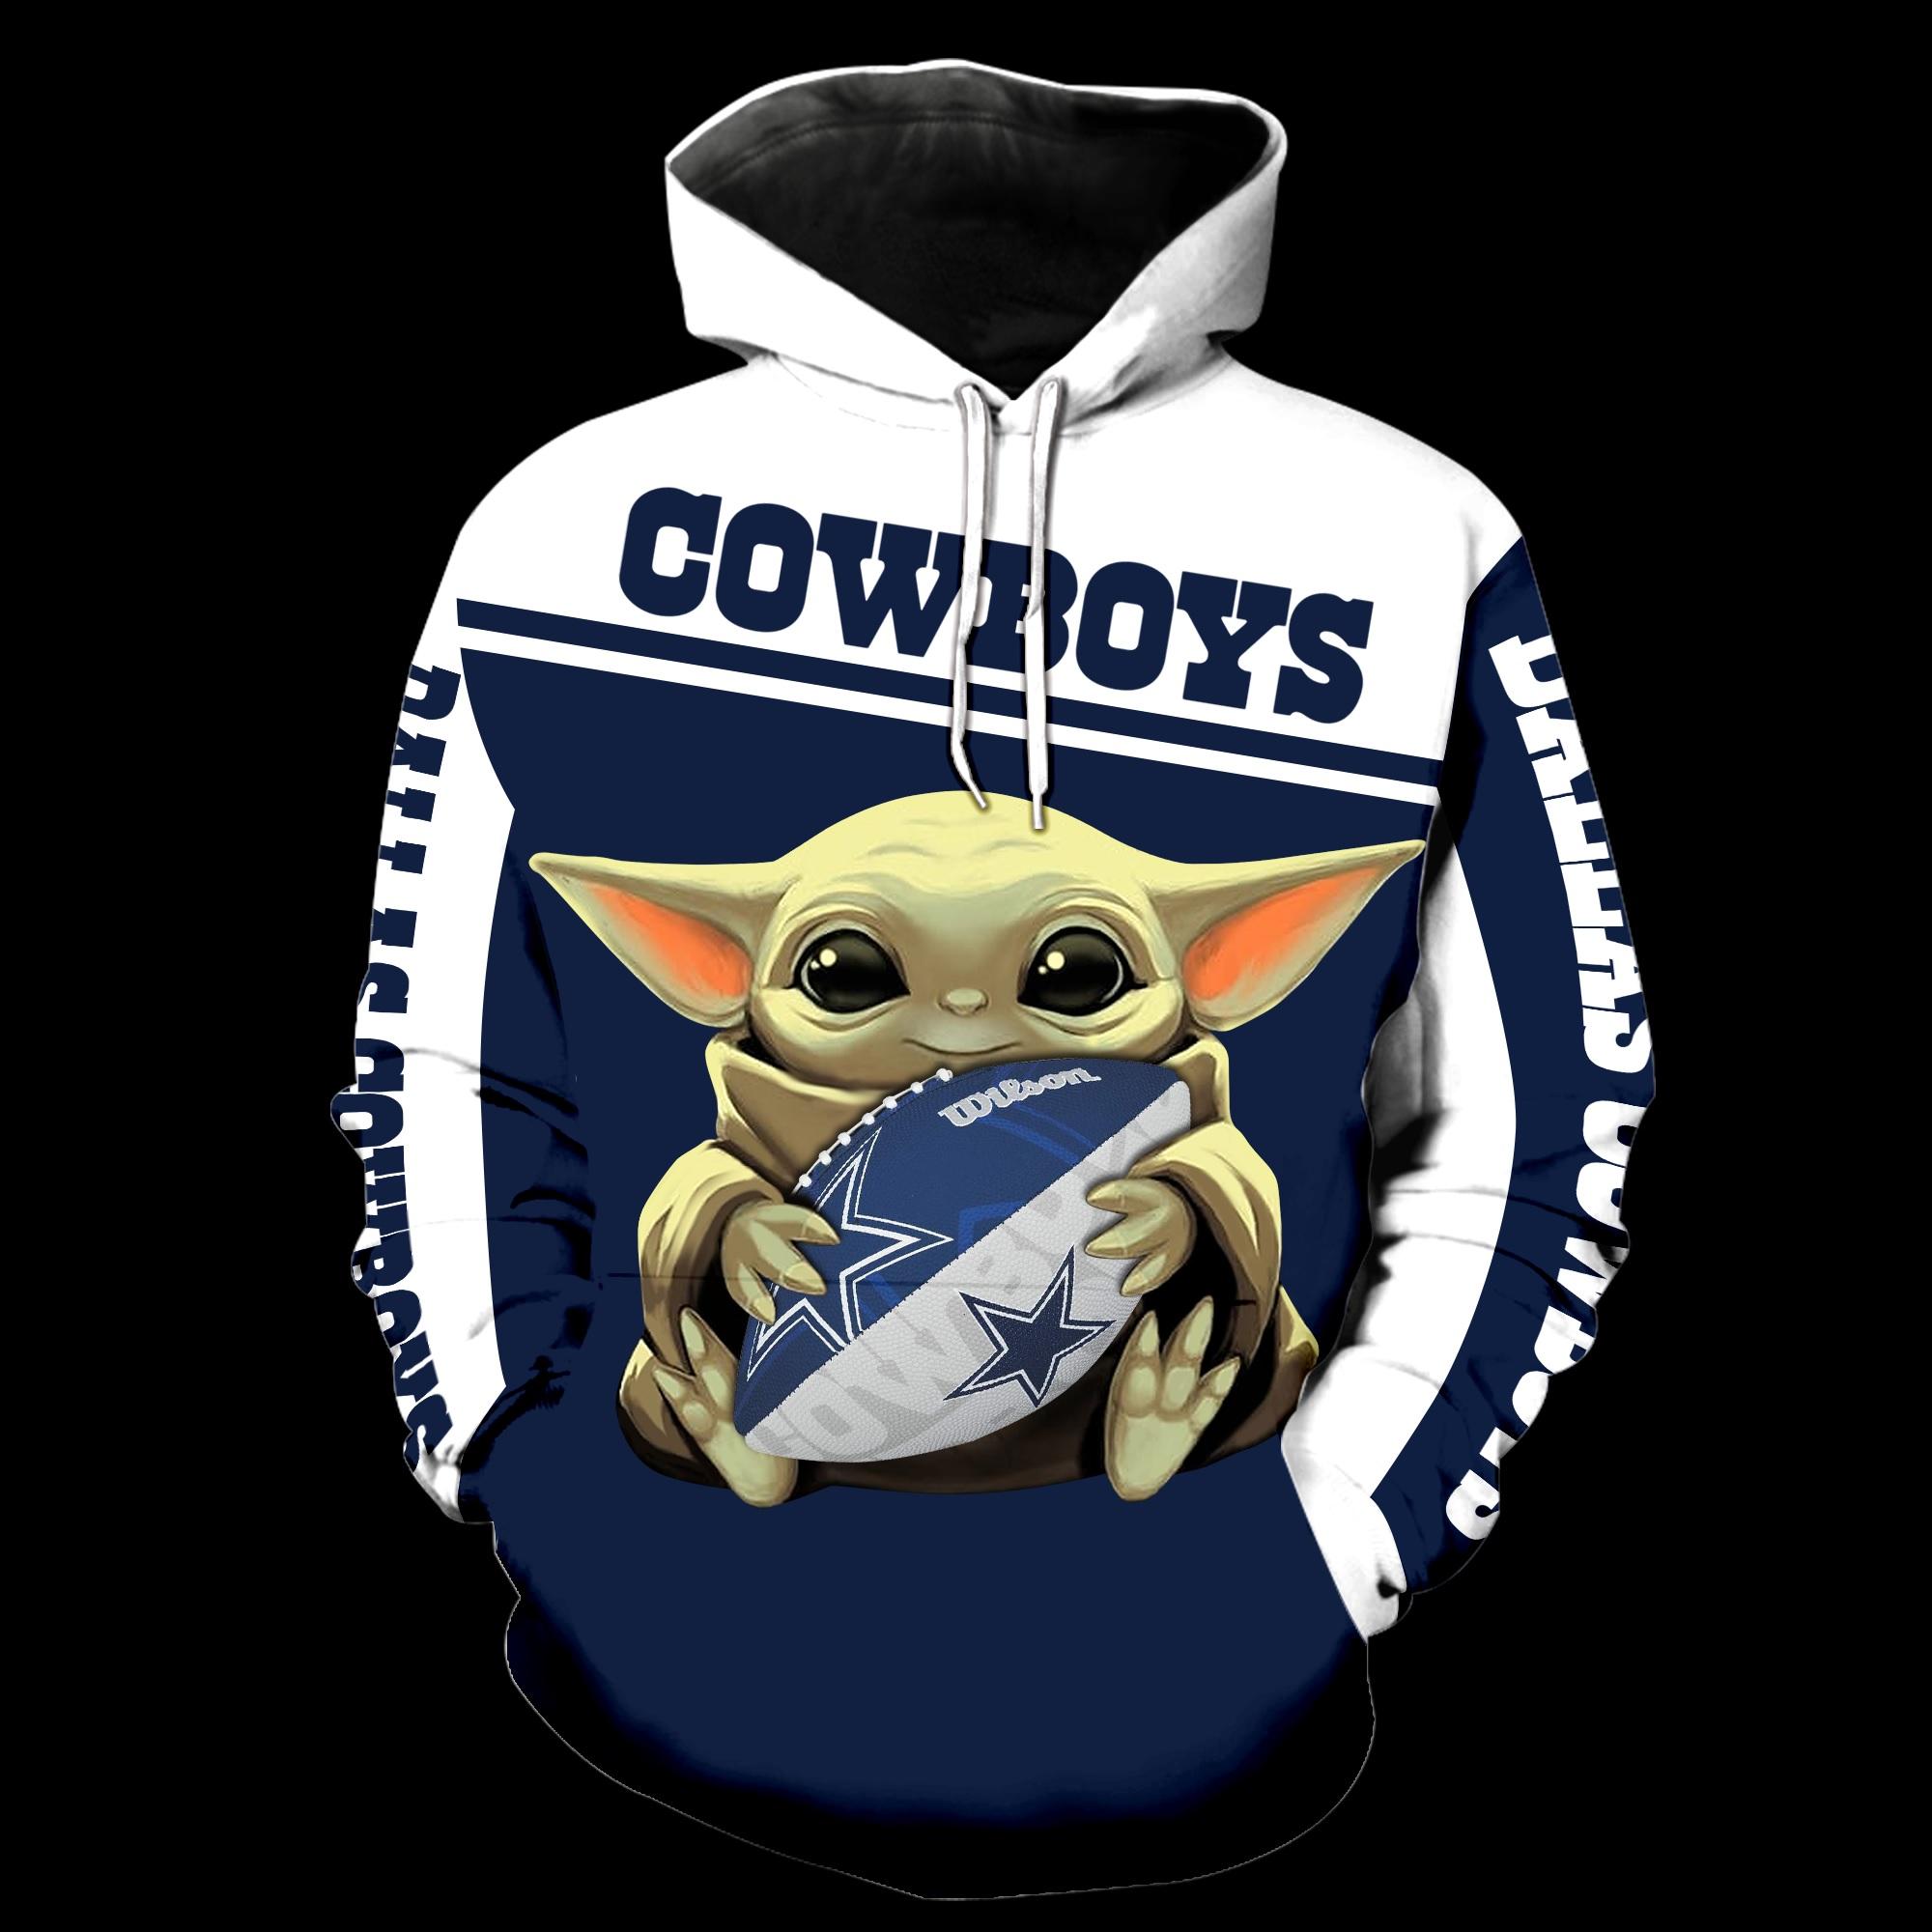 Dallas cowboys baby yoda all over print hoodie